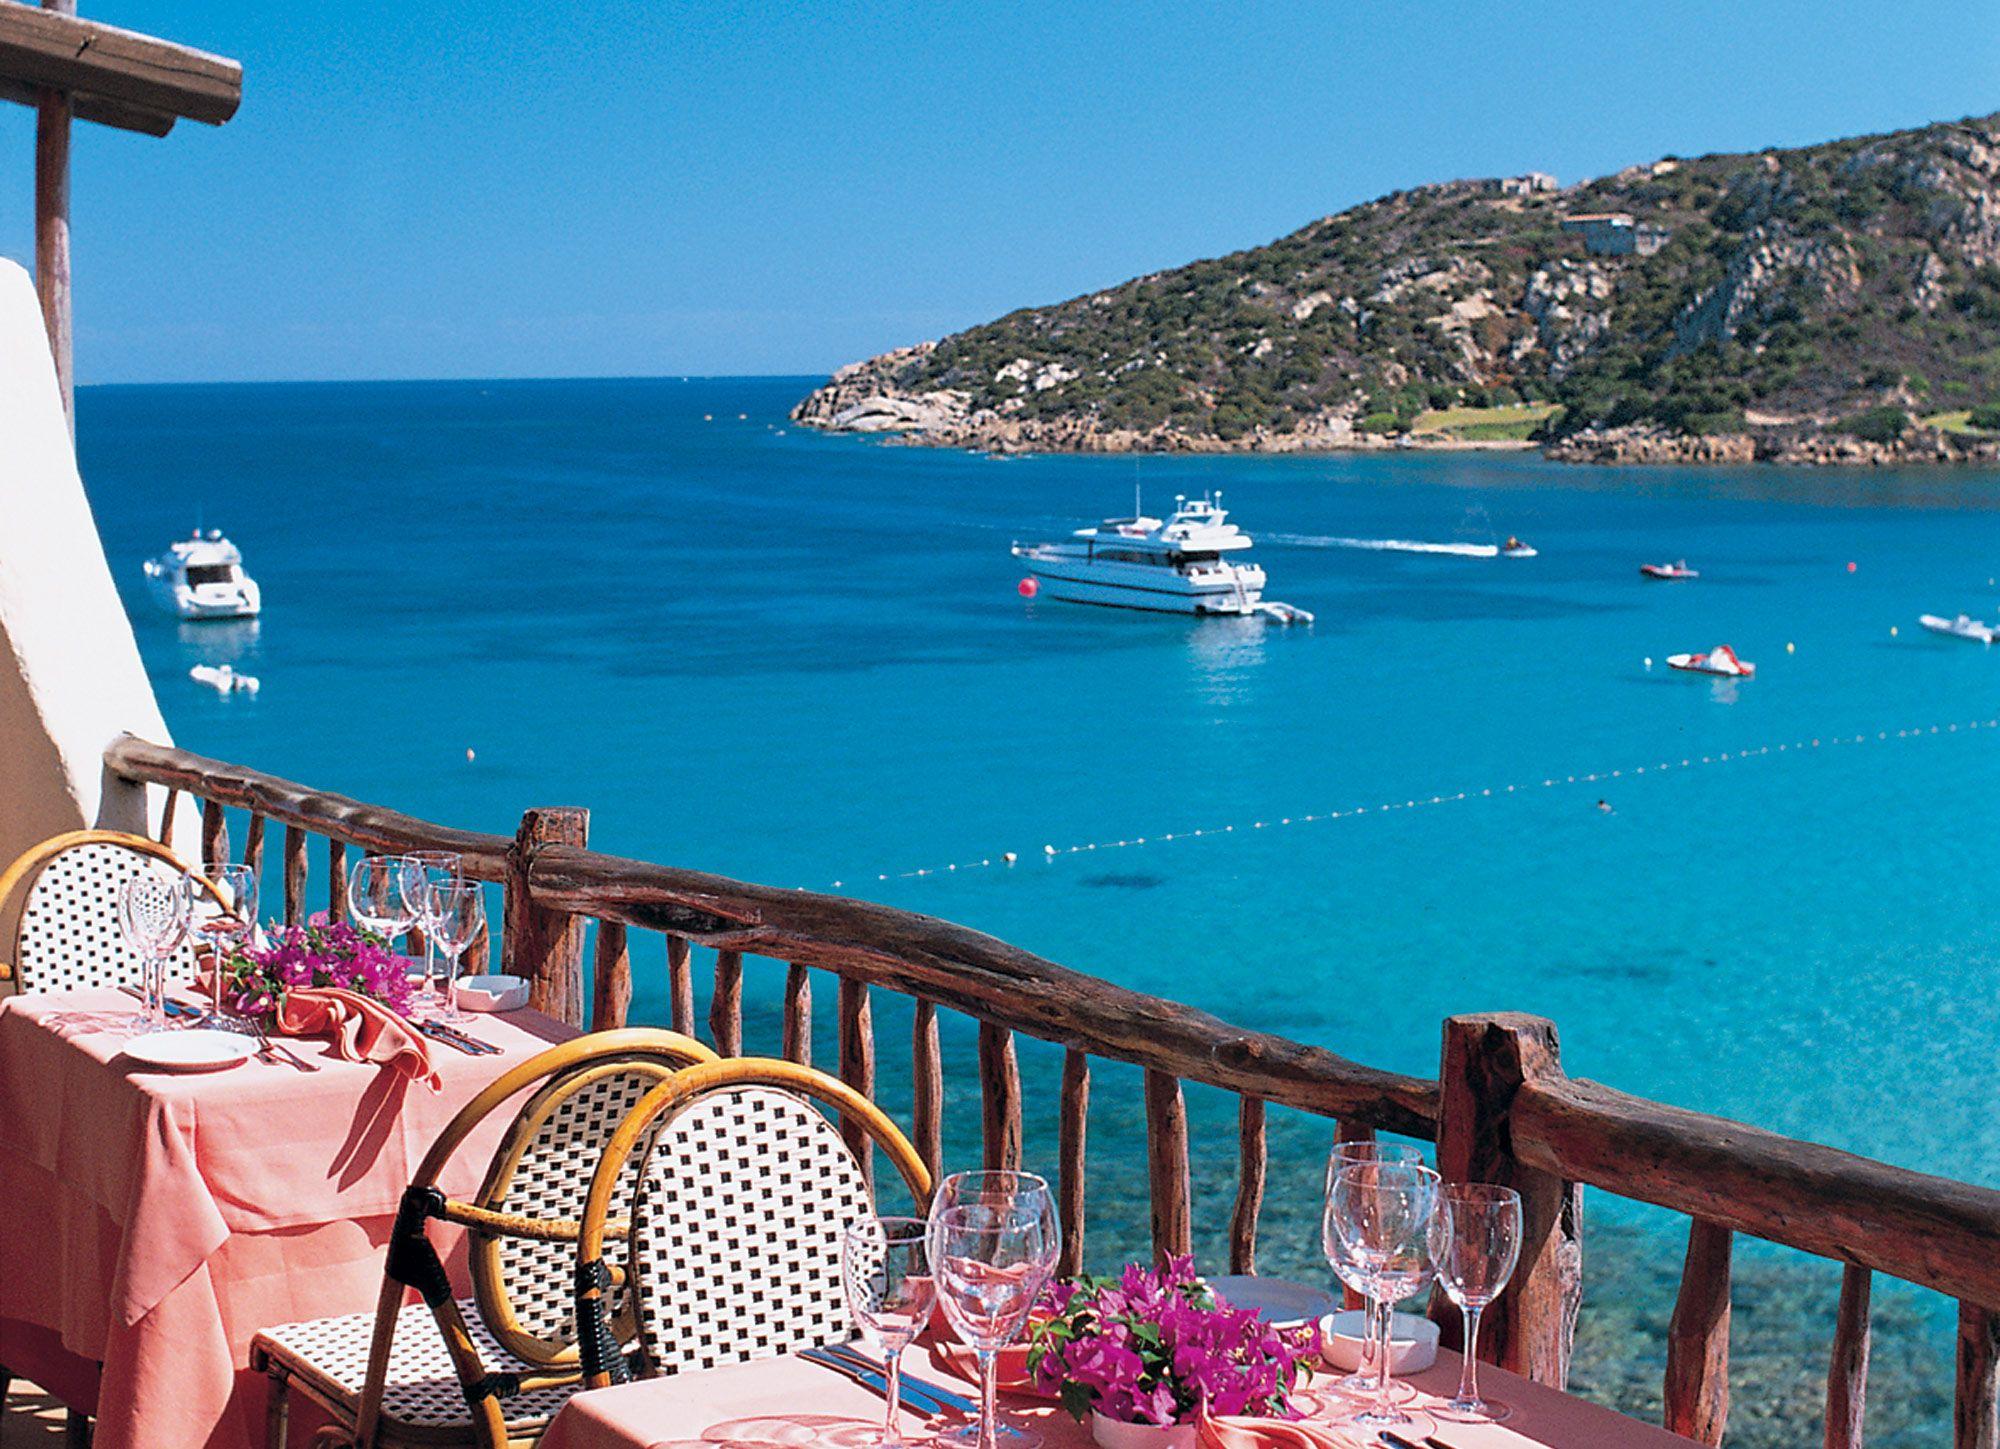 Baia Sardinia Beach Fron The Club Hotel Italy Holidays Sardinia